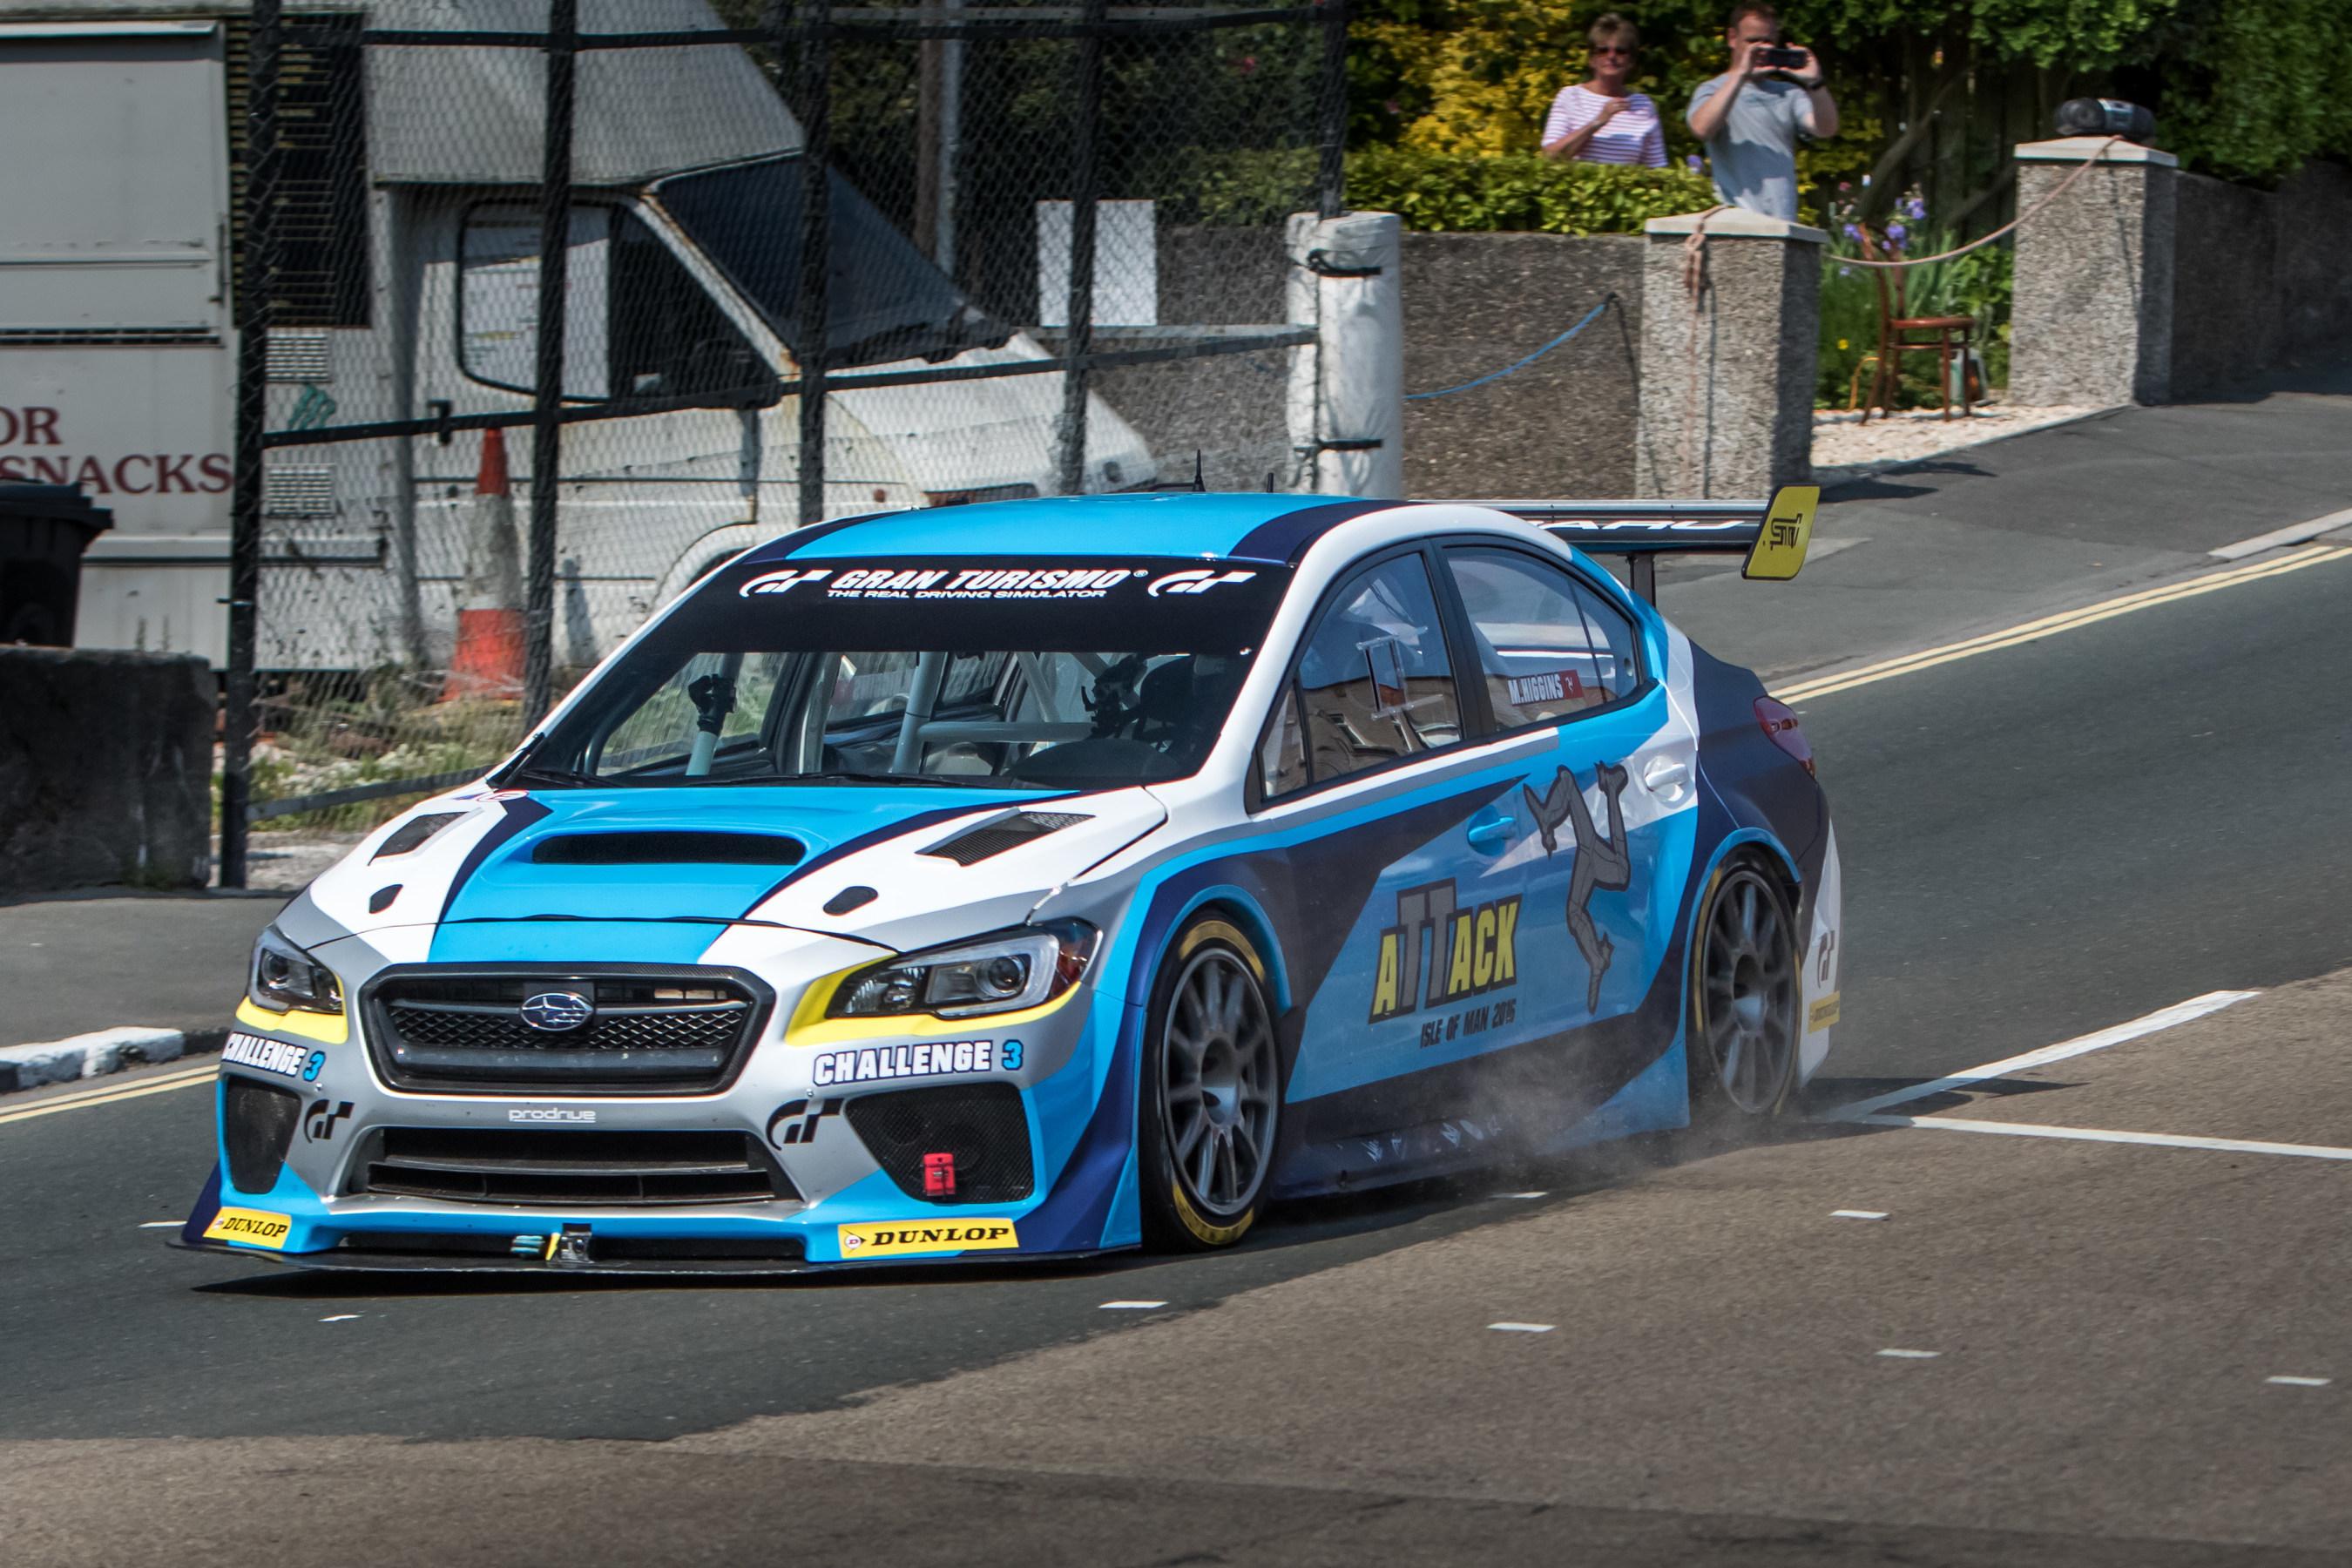 2016 Subaru Wrx Sti Isle Of Man Tt Time Car Shatters Lap Record